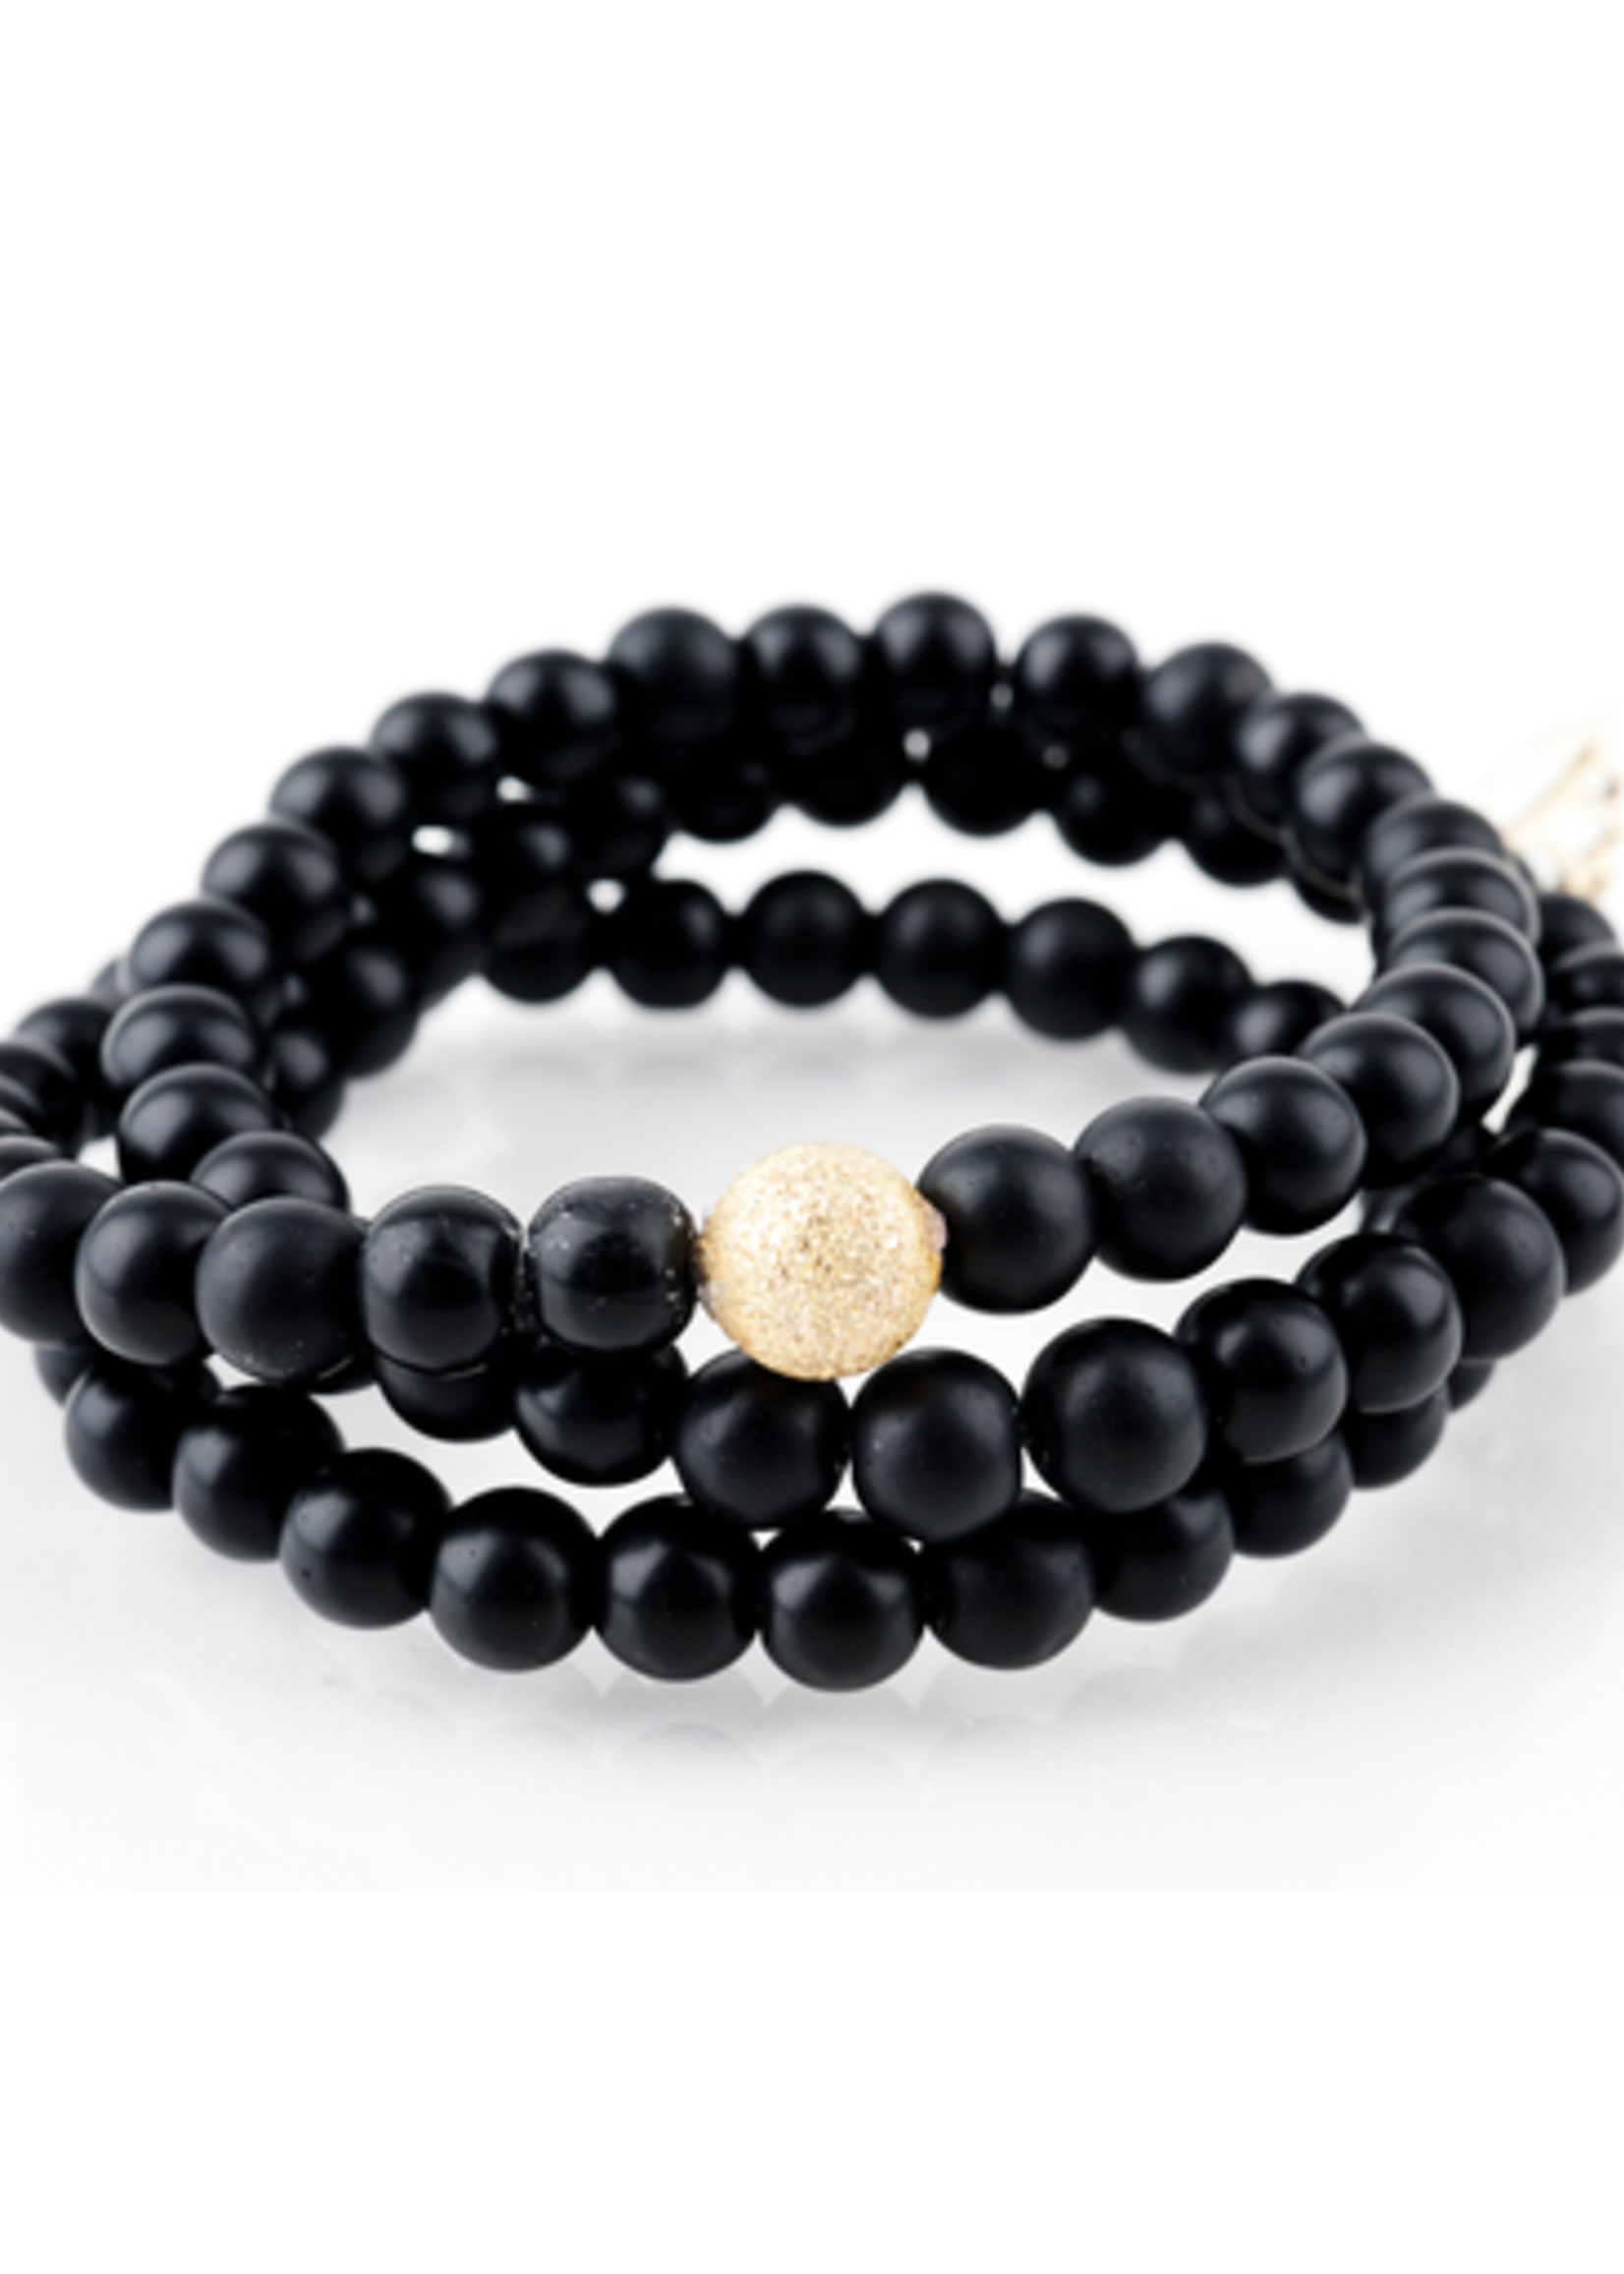 Mina Danielle Black Onyx Wrap with Gold Stardust Bead